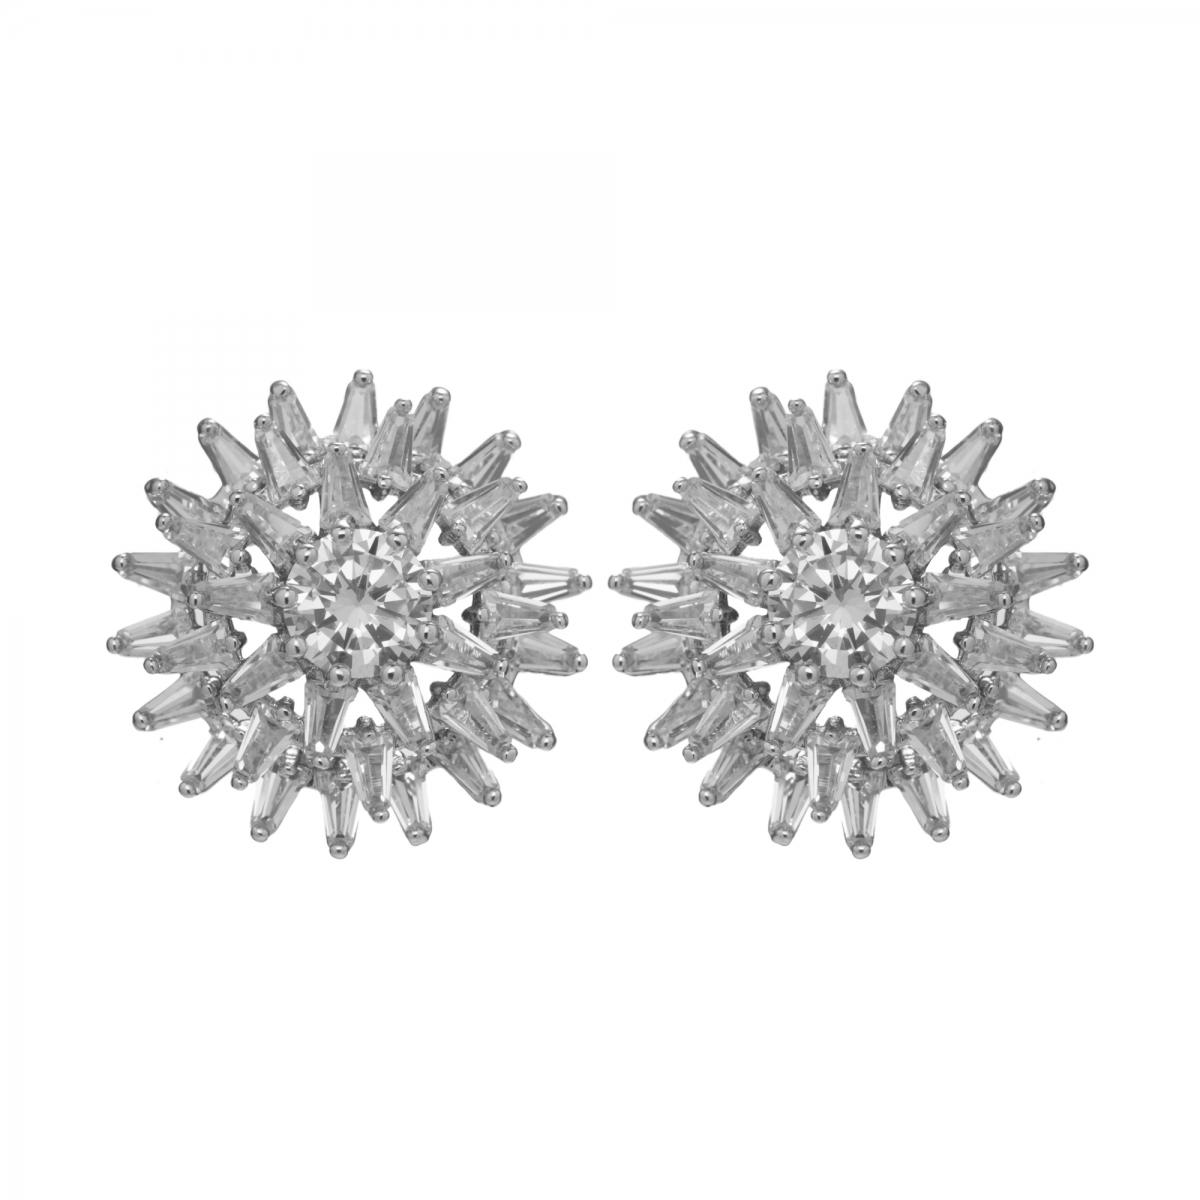 Náušnice Star Zircon Crystals Stainless Steel